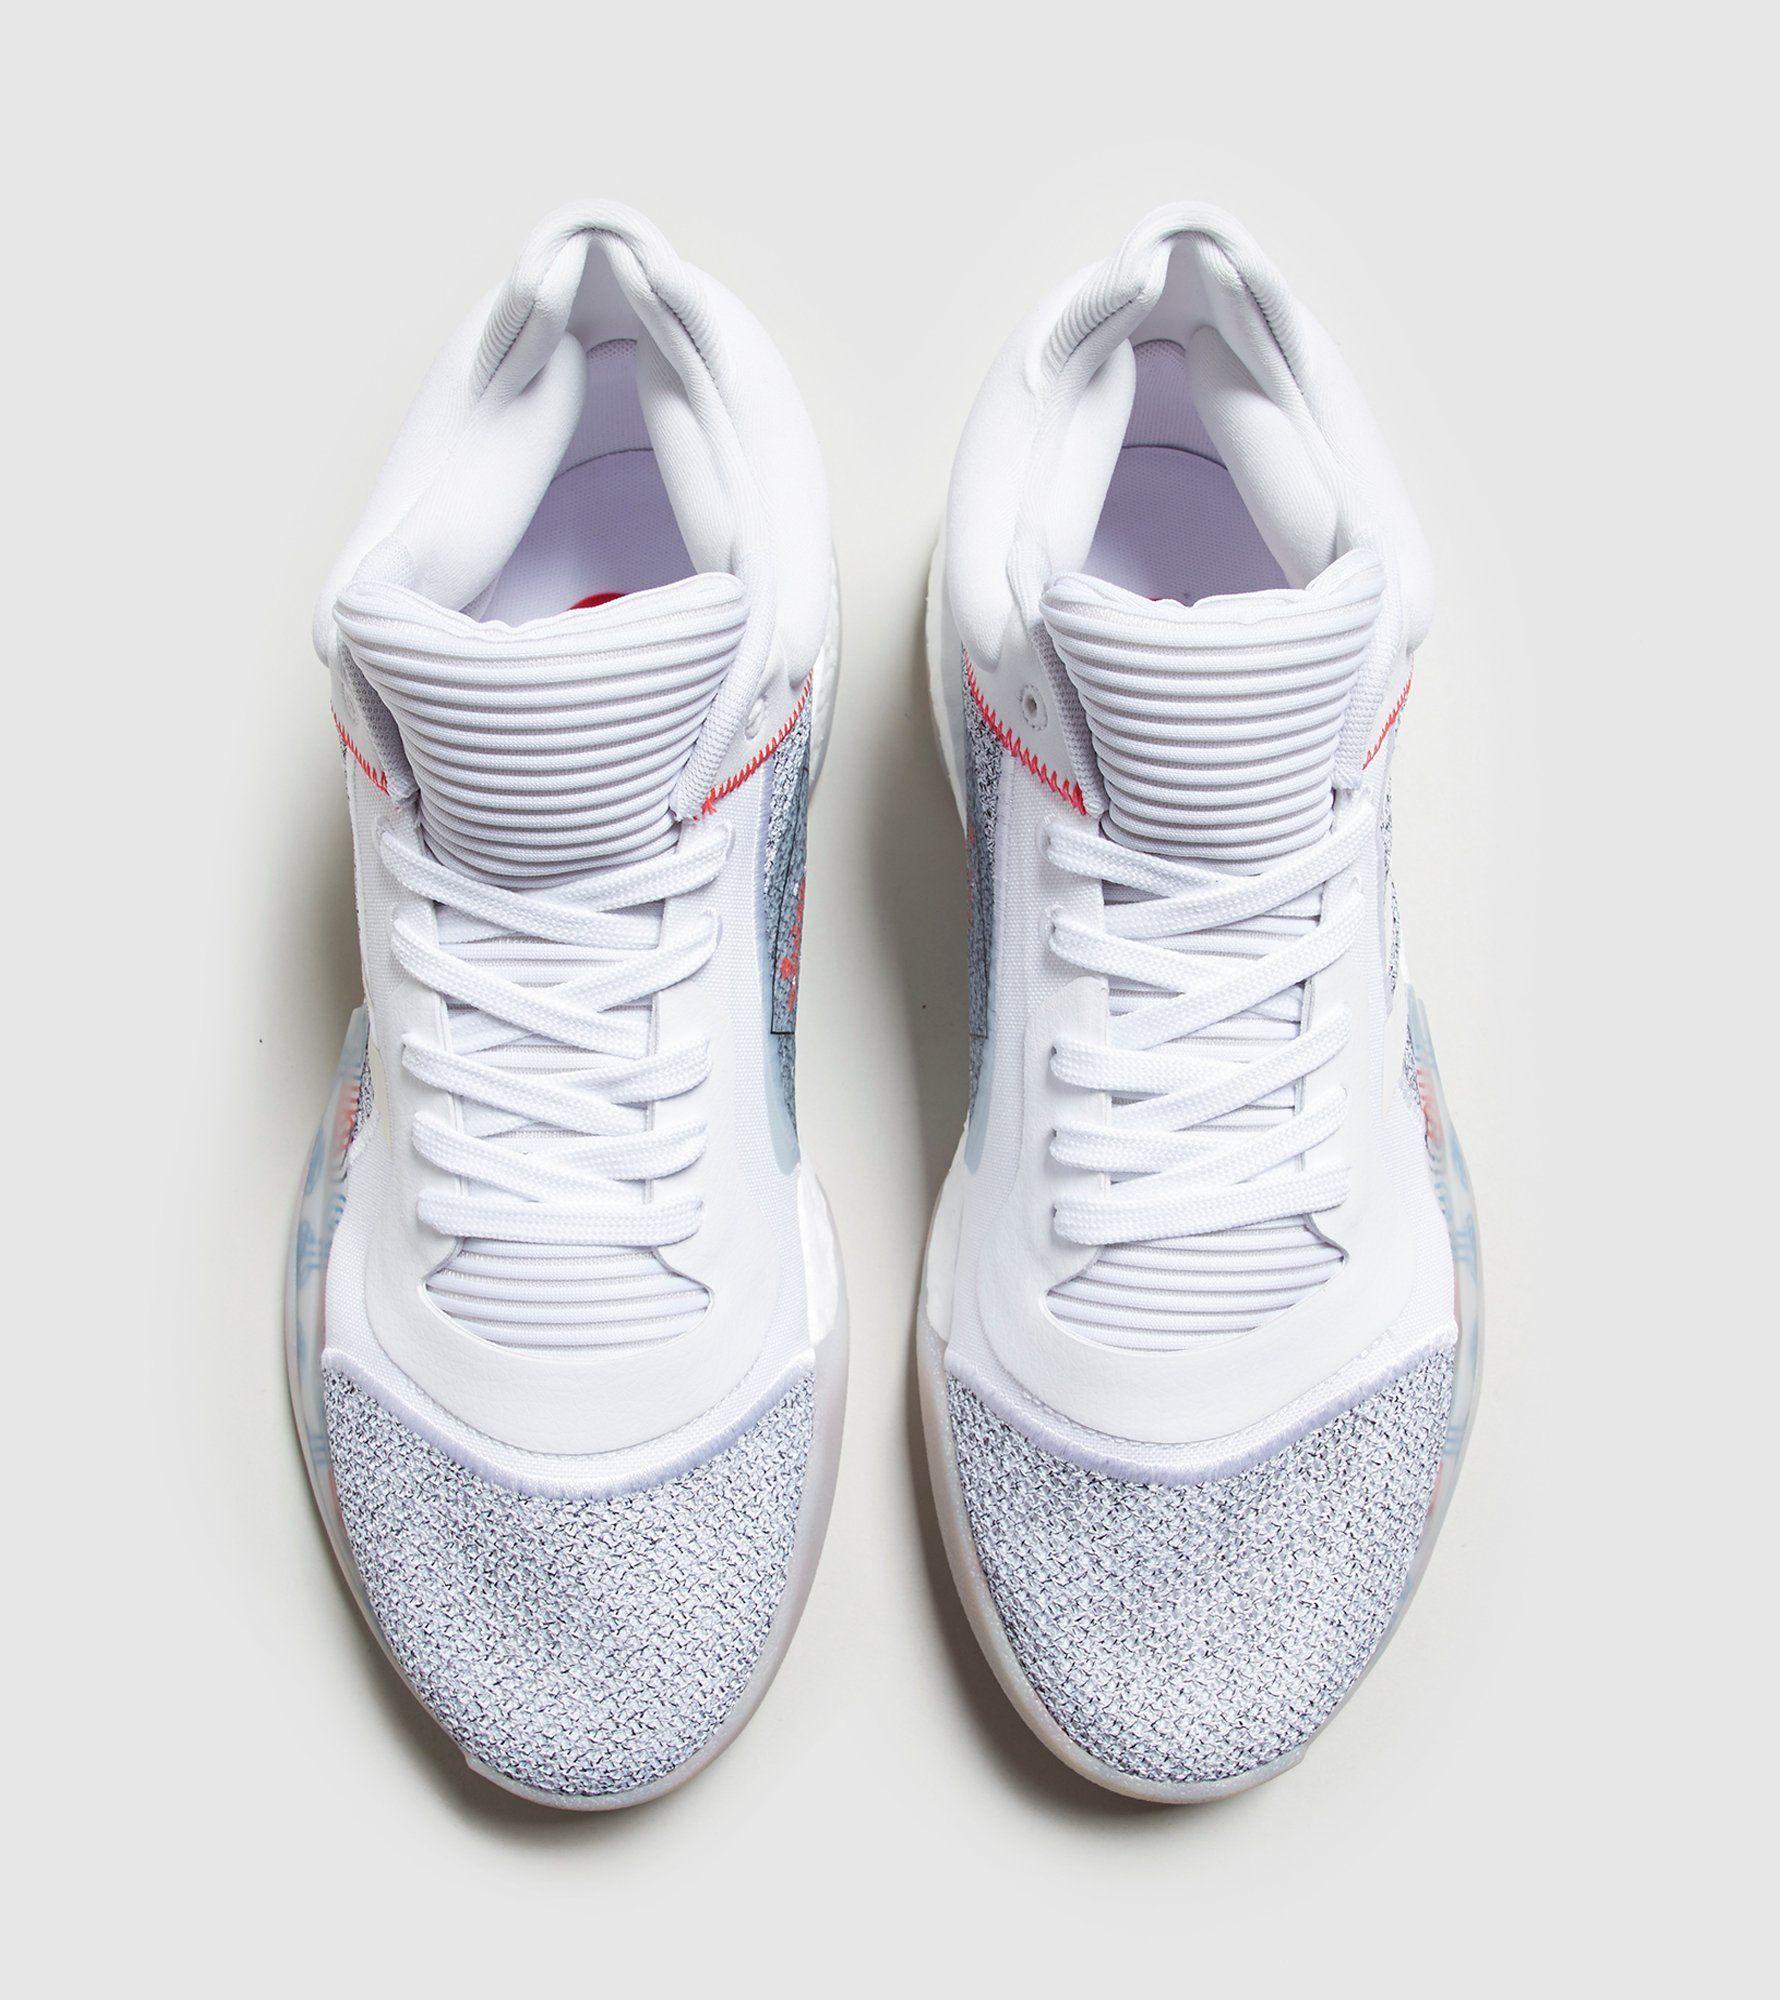 adidas Originals Marquee Boost Low